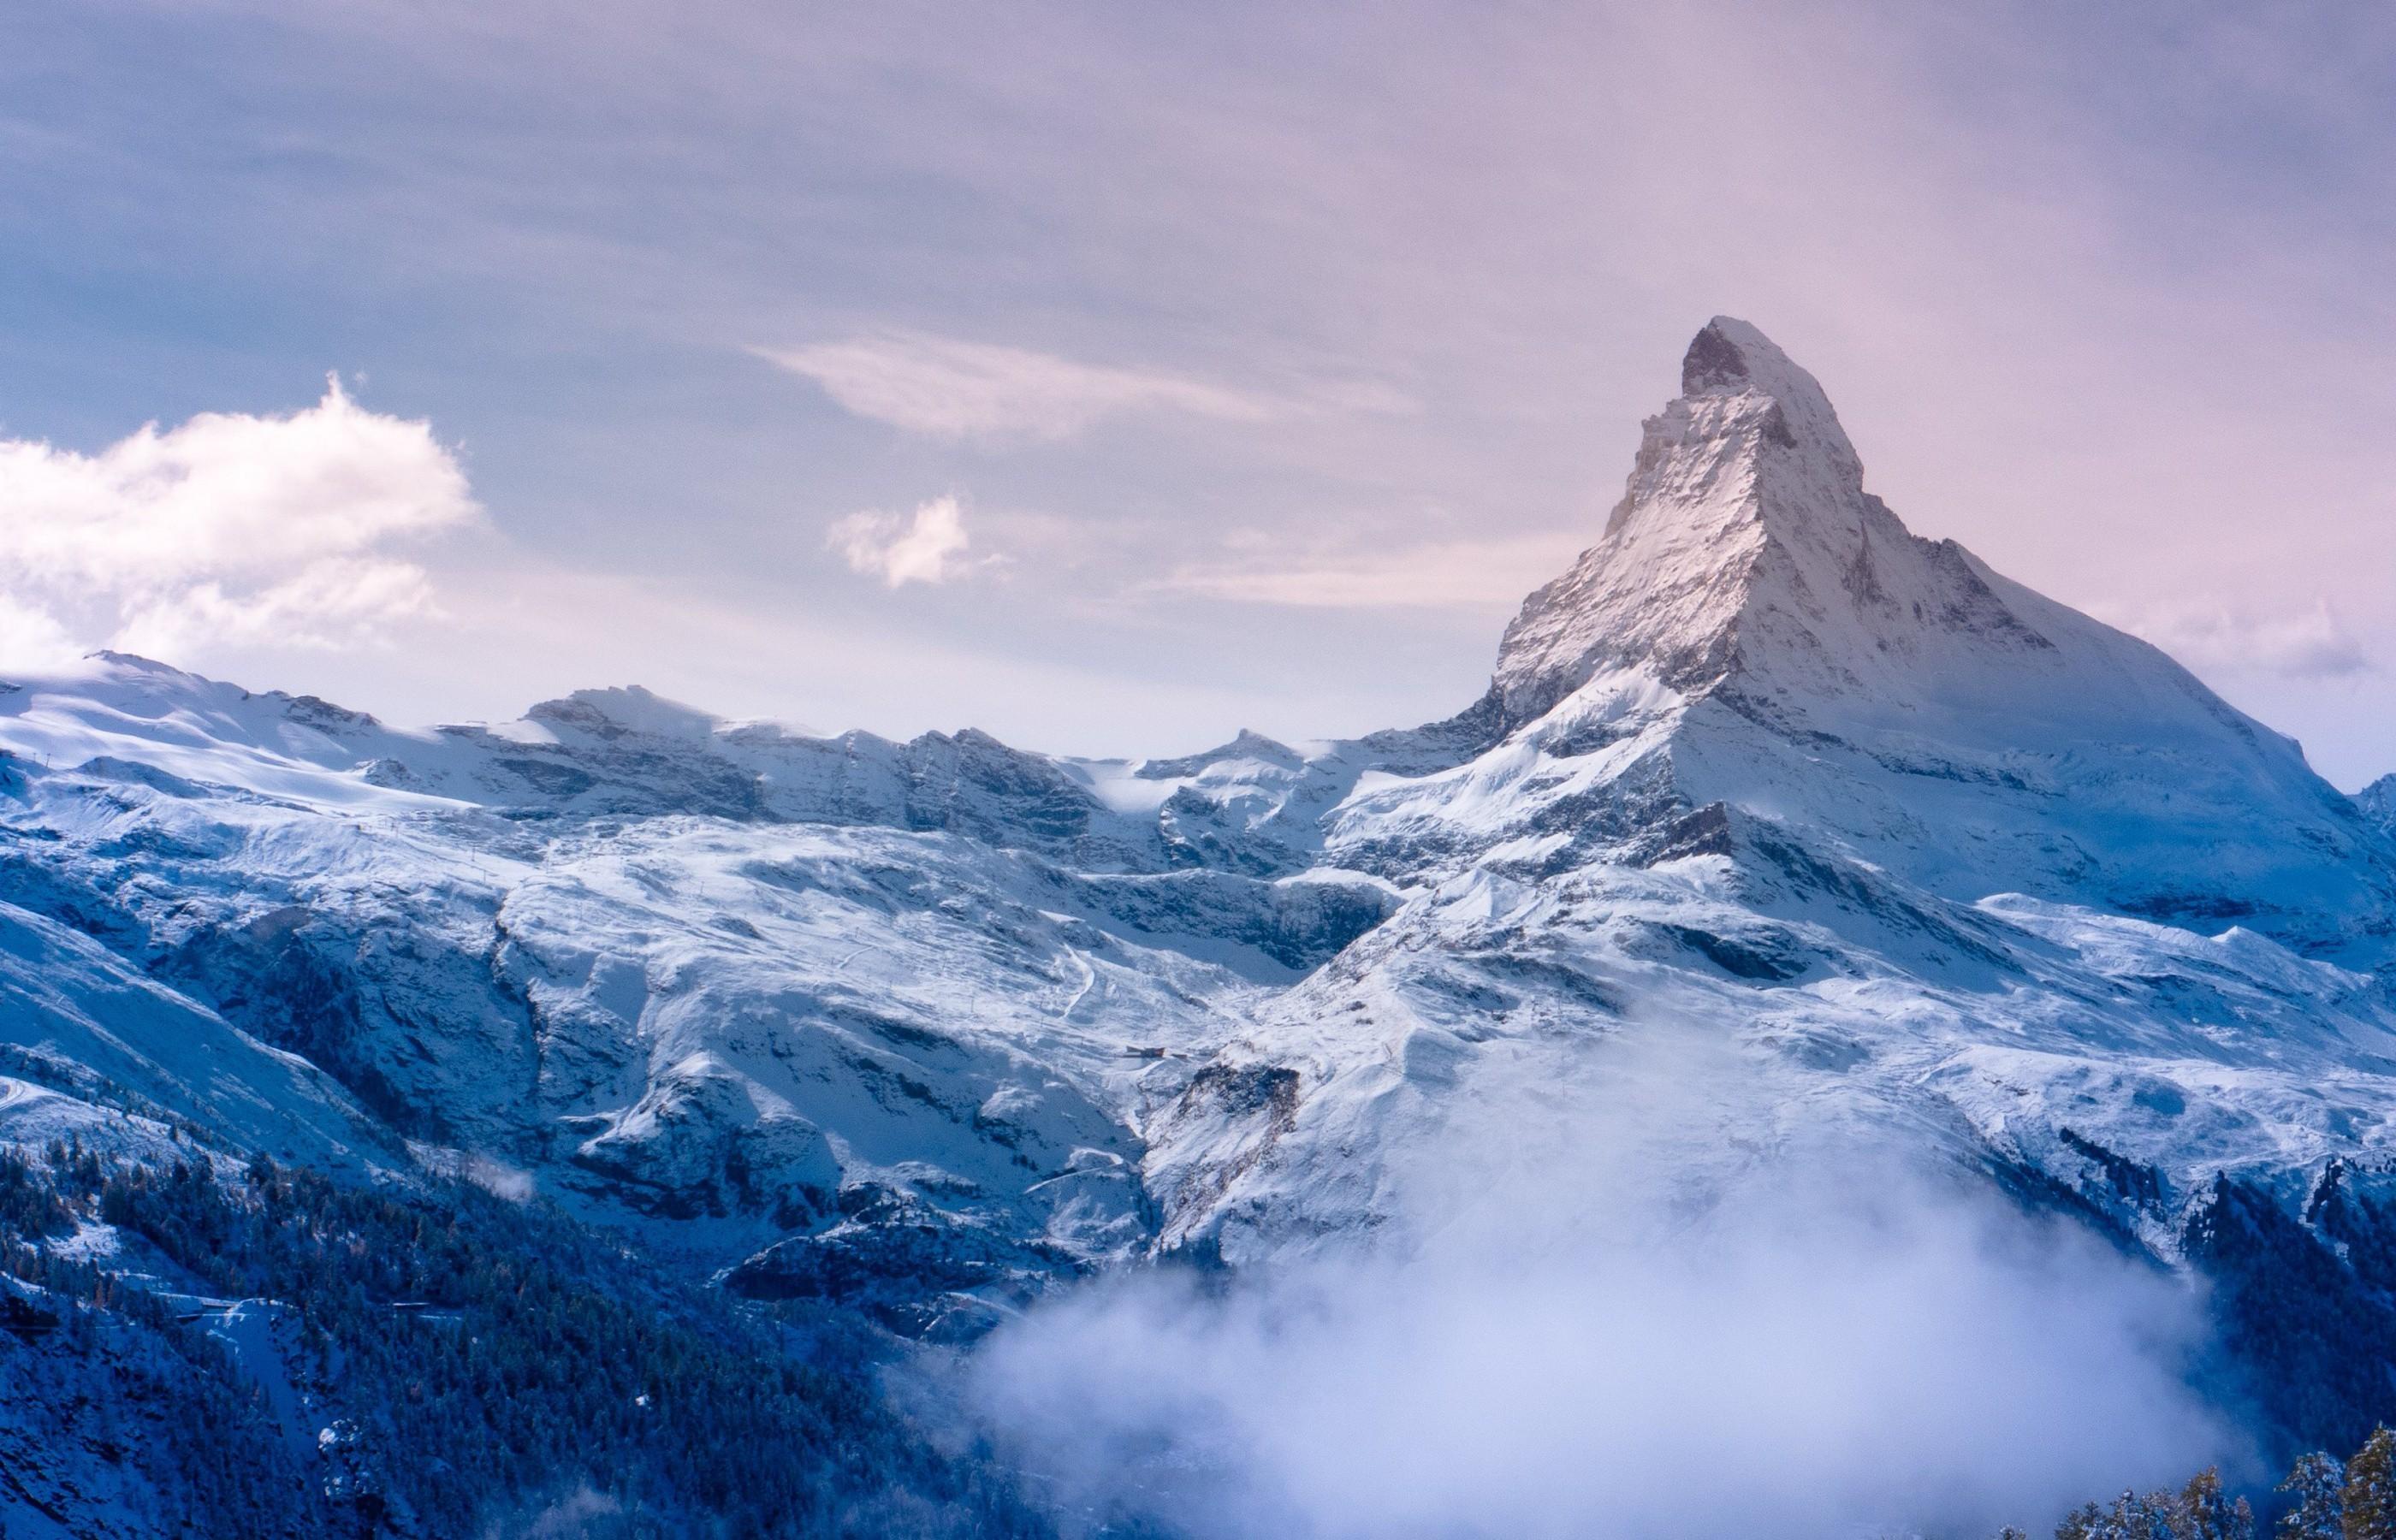 Snowy-Mountain-Nature-HD-Wallpaper-Wide.jpg (2800×1800) | winter |  Pinterest | Winter